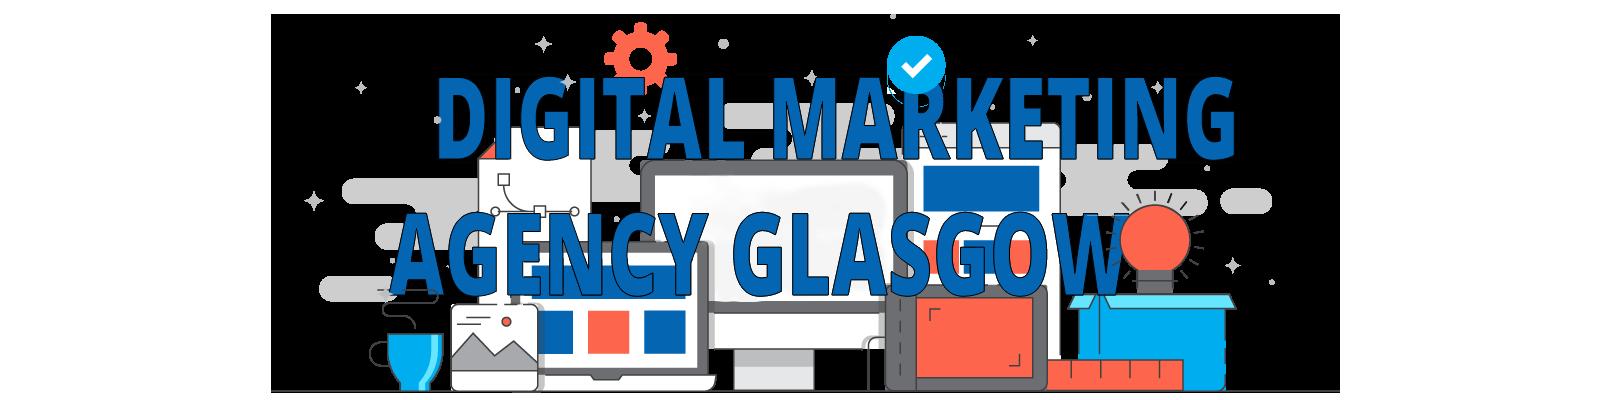 seek social digital marketing agency glasgow header with transparent background